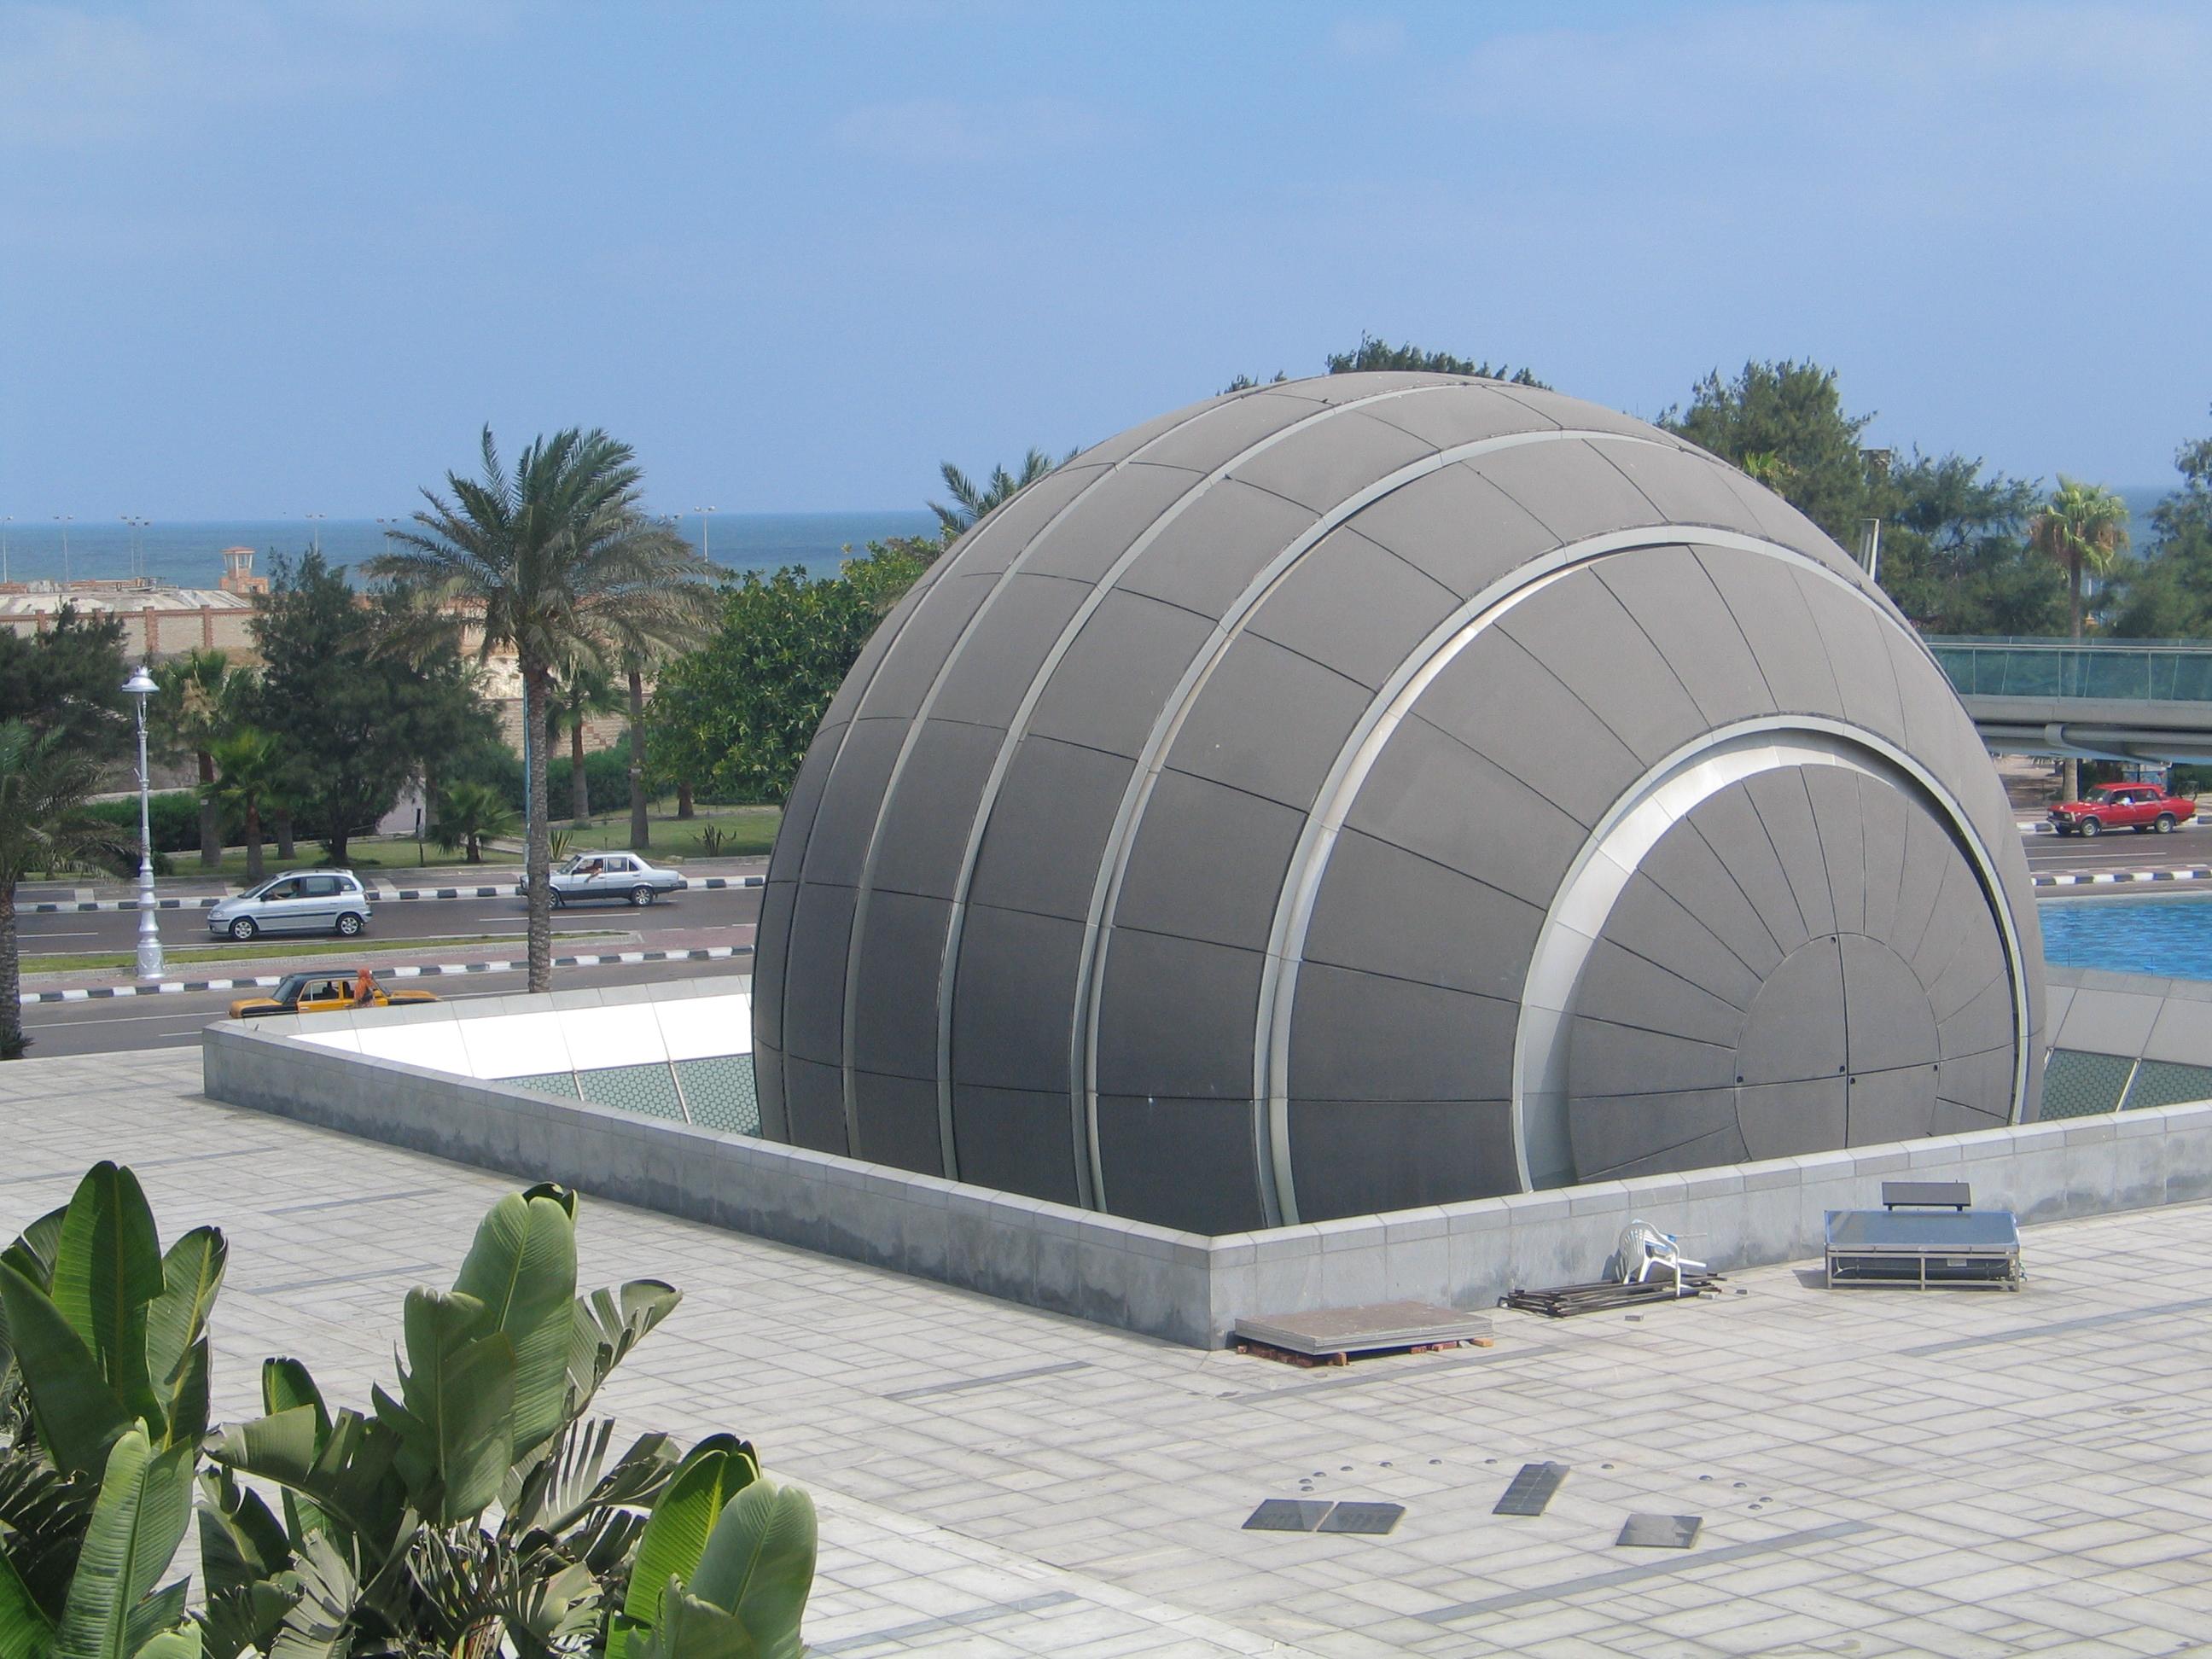 solar systems ahaped dome - photo #1